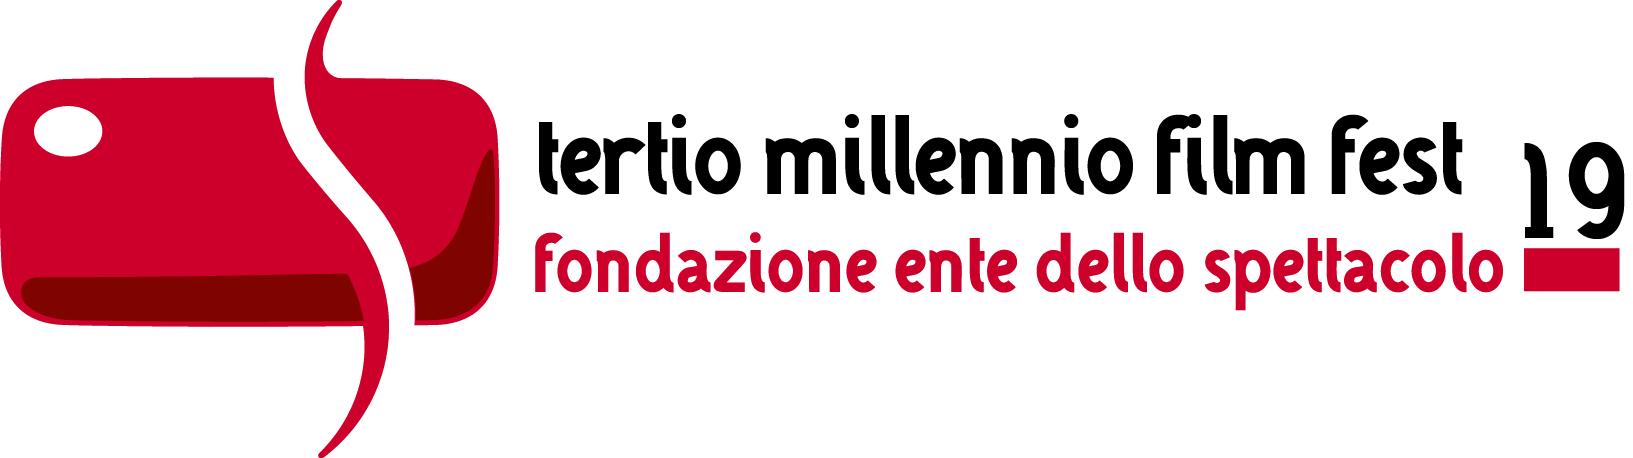 logo_tertio_edit_ed19.jpg